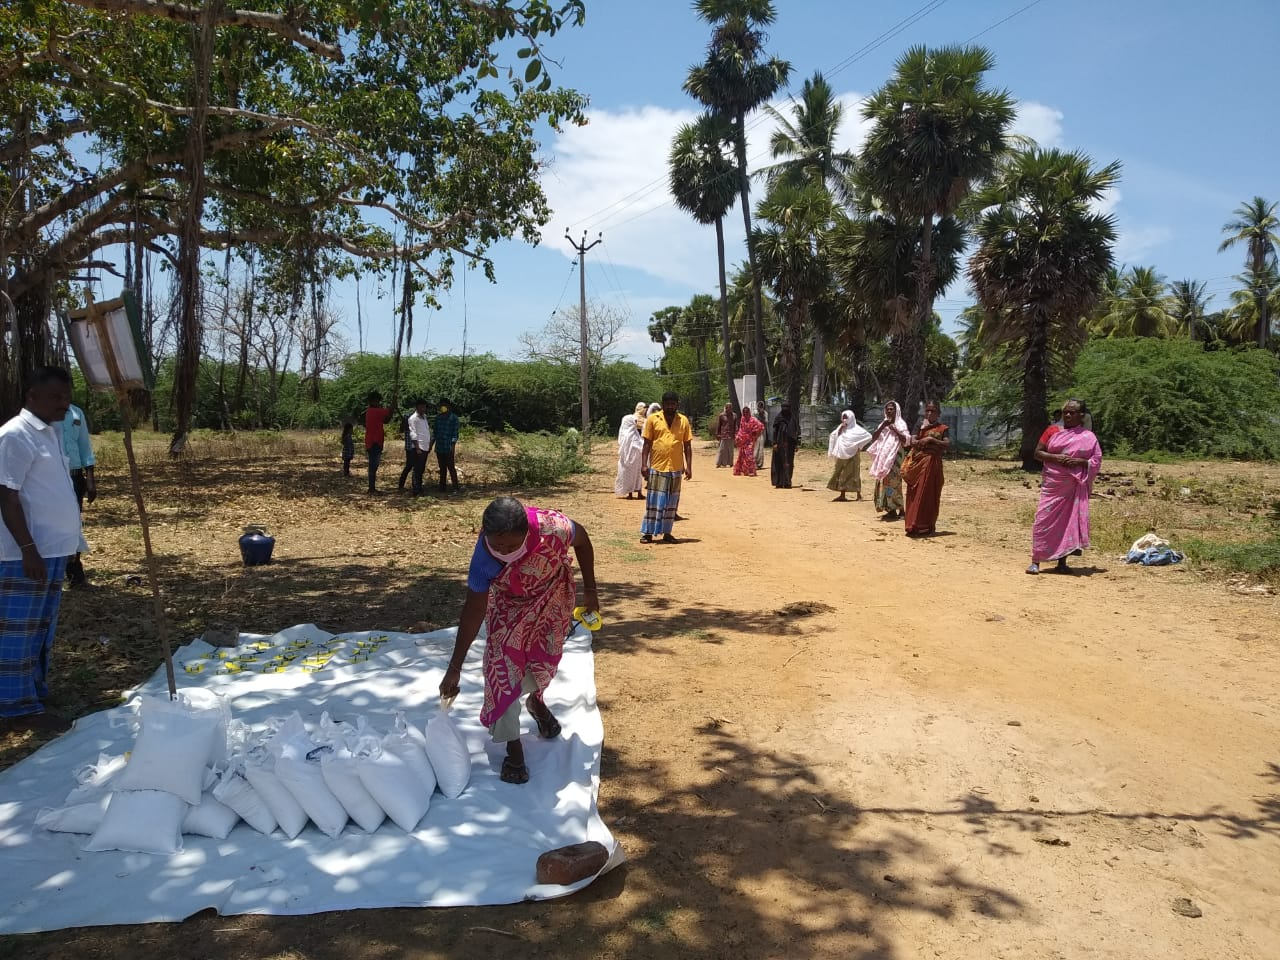 OMCAR_rice_donation_7_May_2020_7